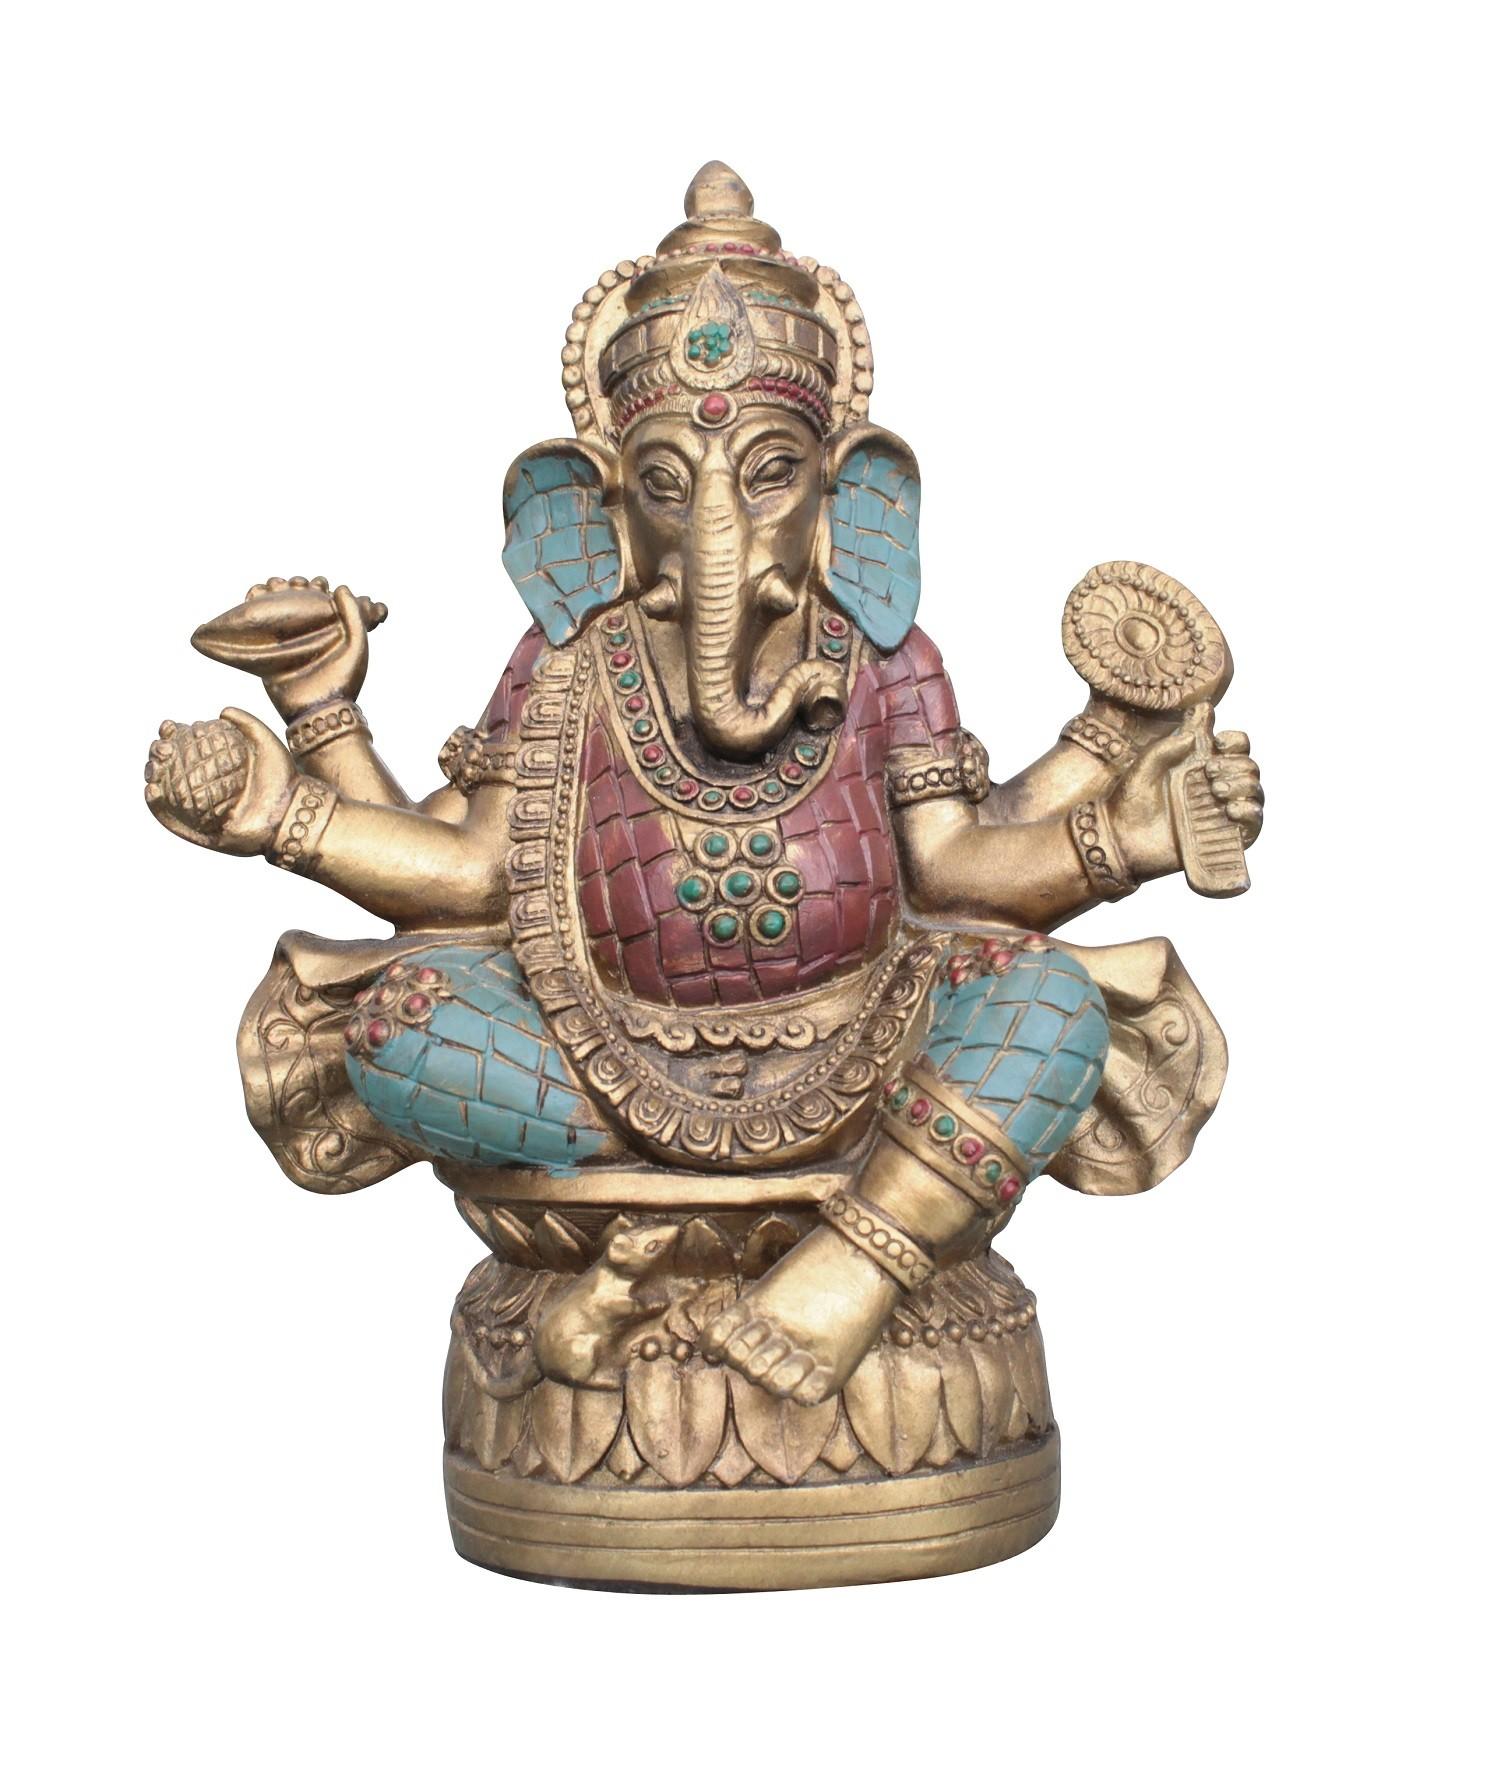 Ganesha Statue 18cm Hinduismus indien buddhismus ganescha Figur buddha budda